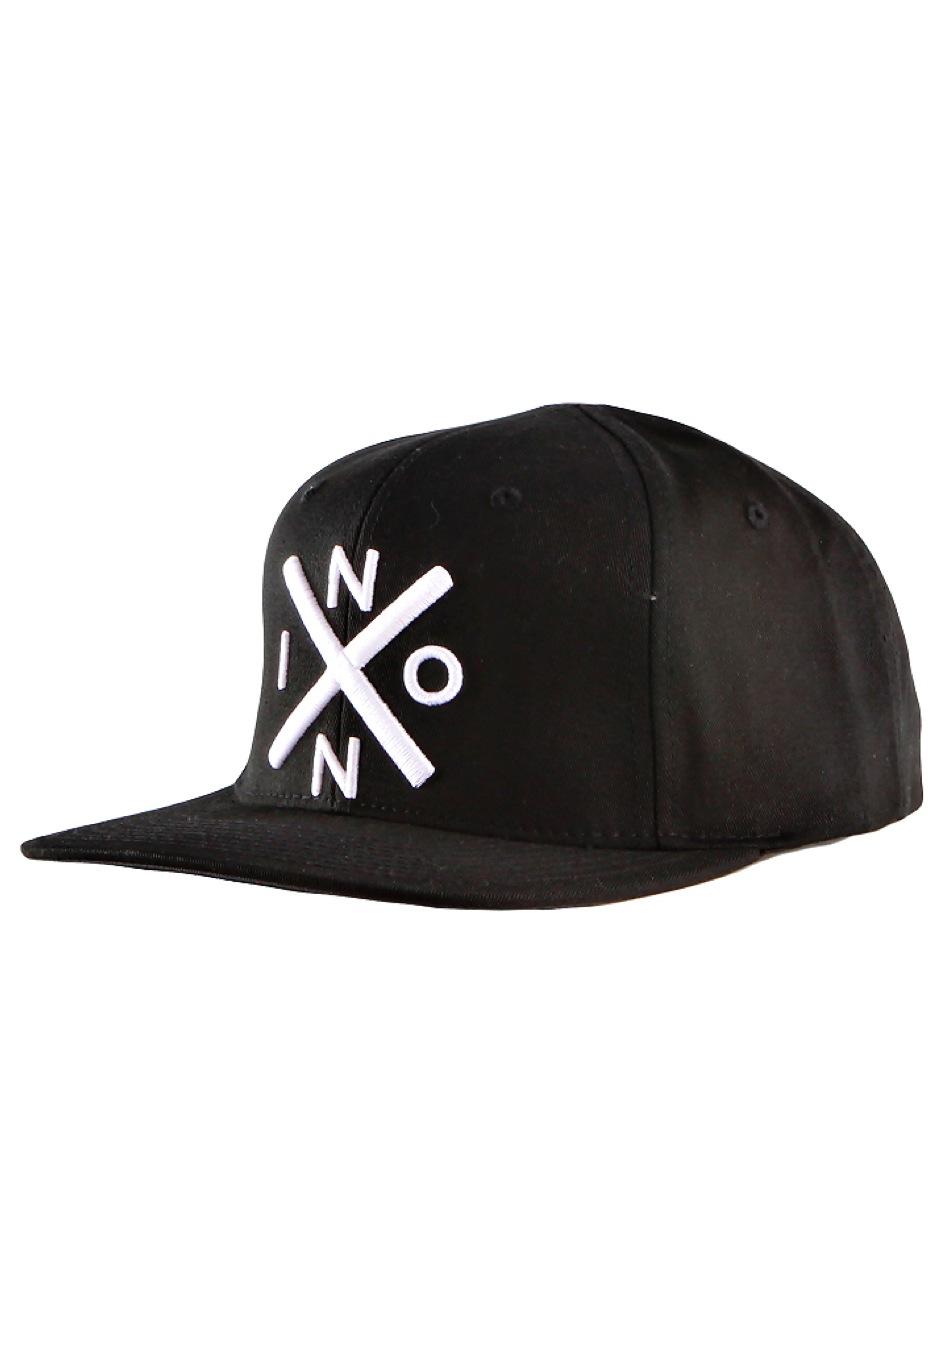 Nixon - Exchange Starter Black White Snapback - Cap - Impericon.com AU 8006aaf1bb7